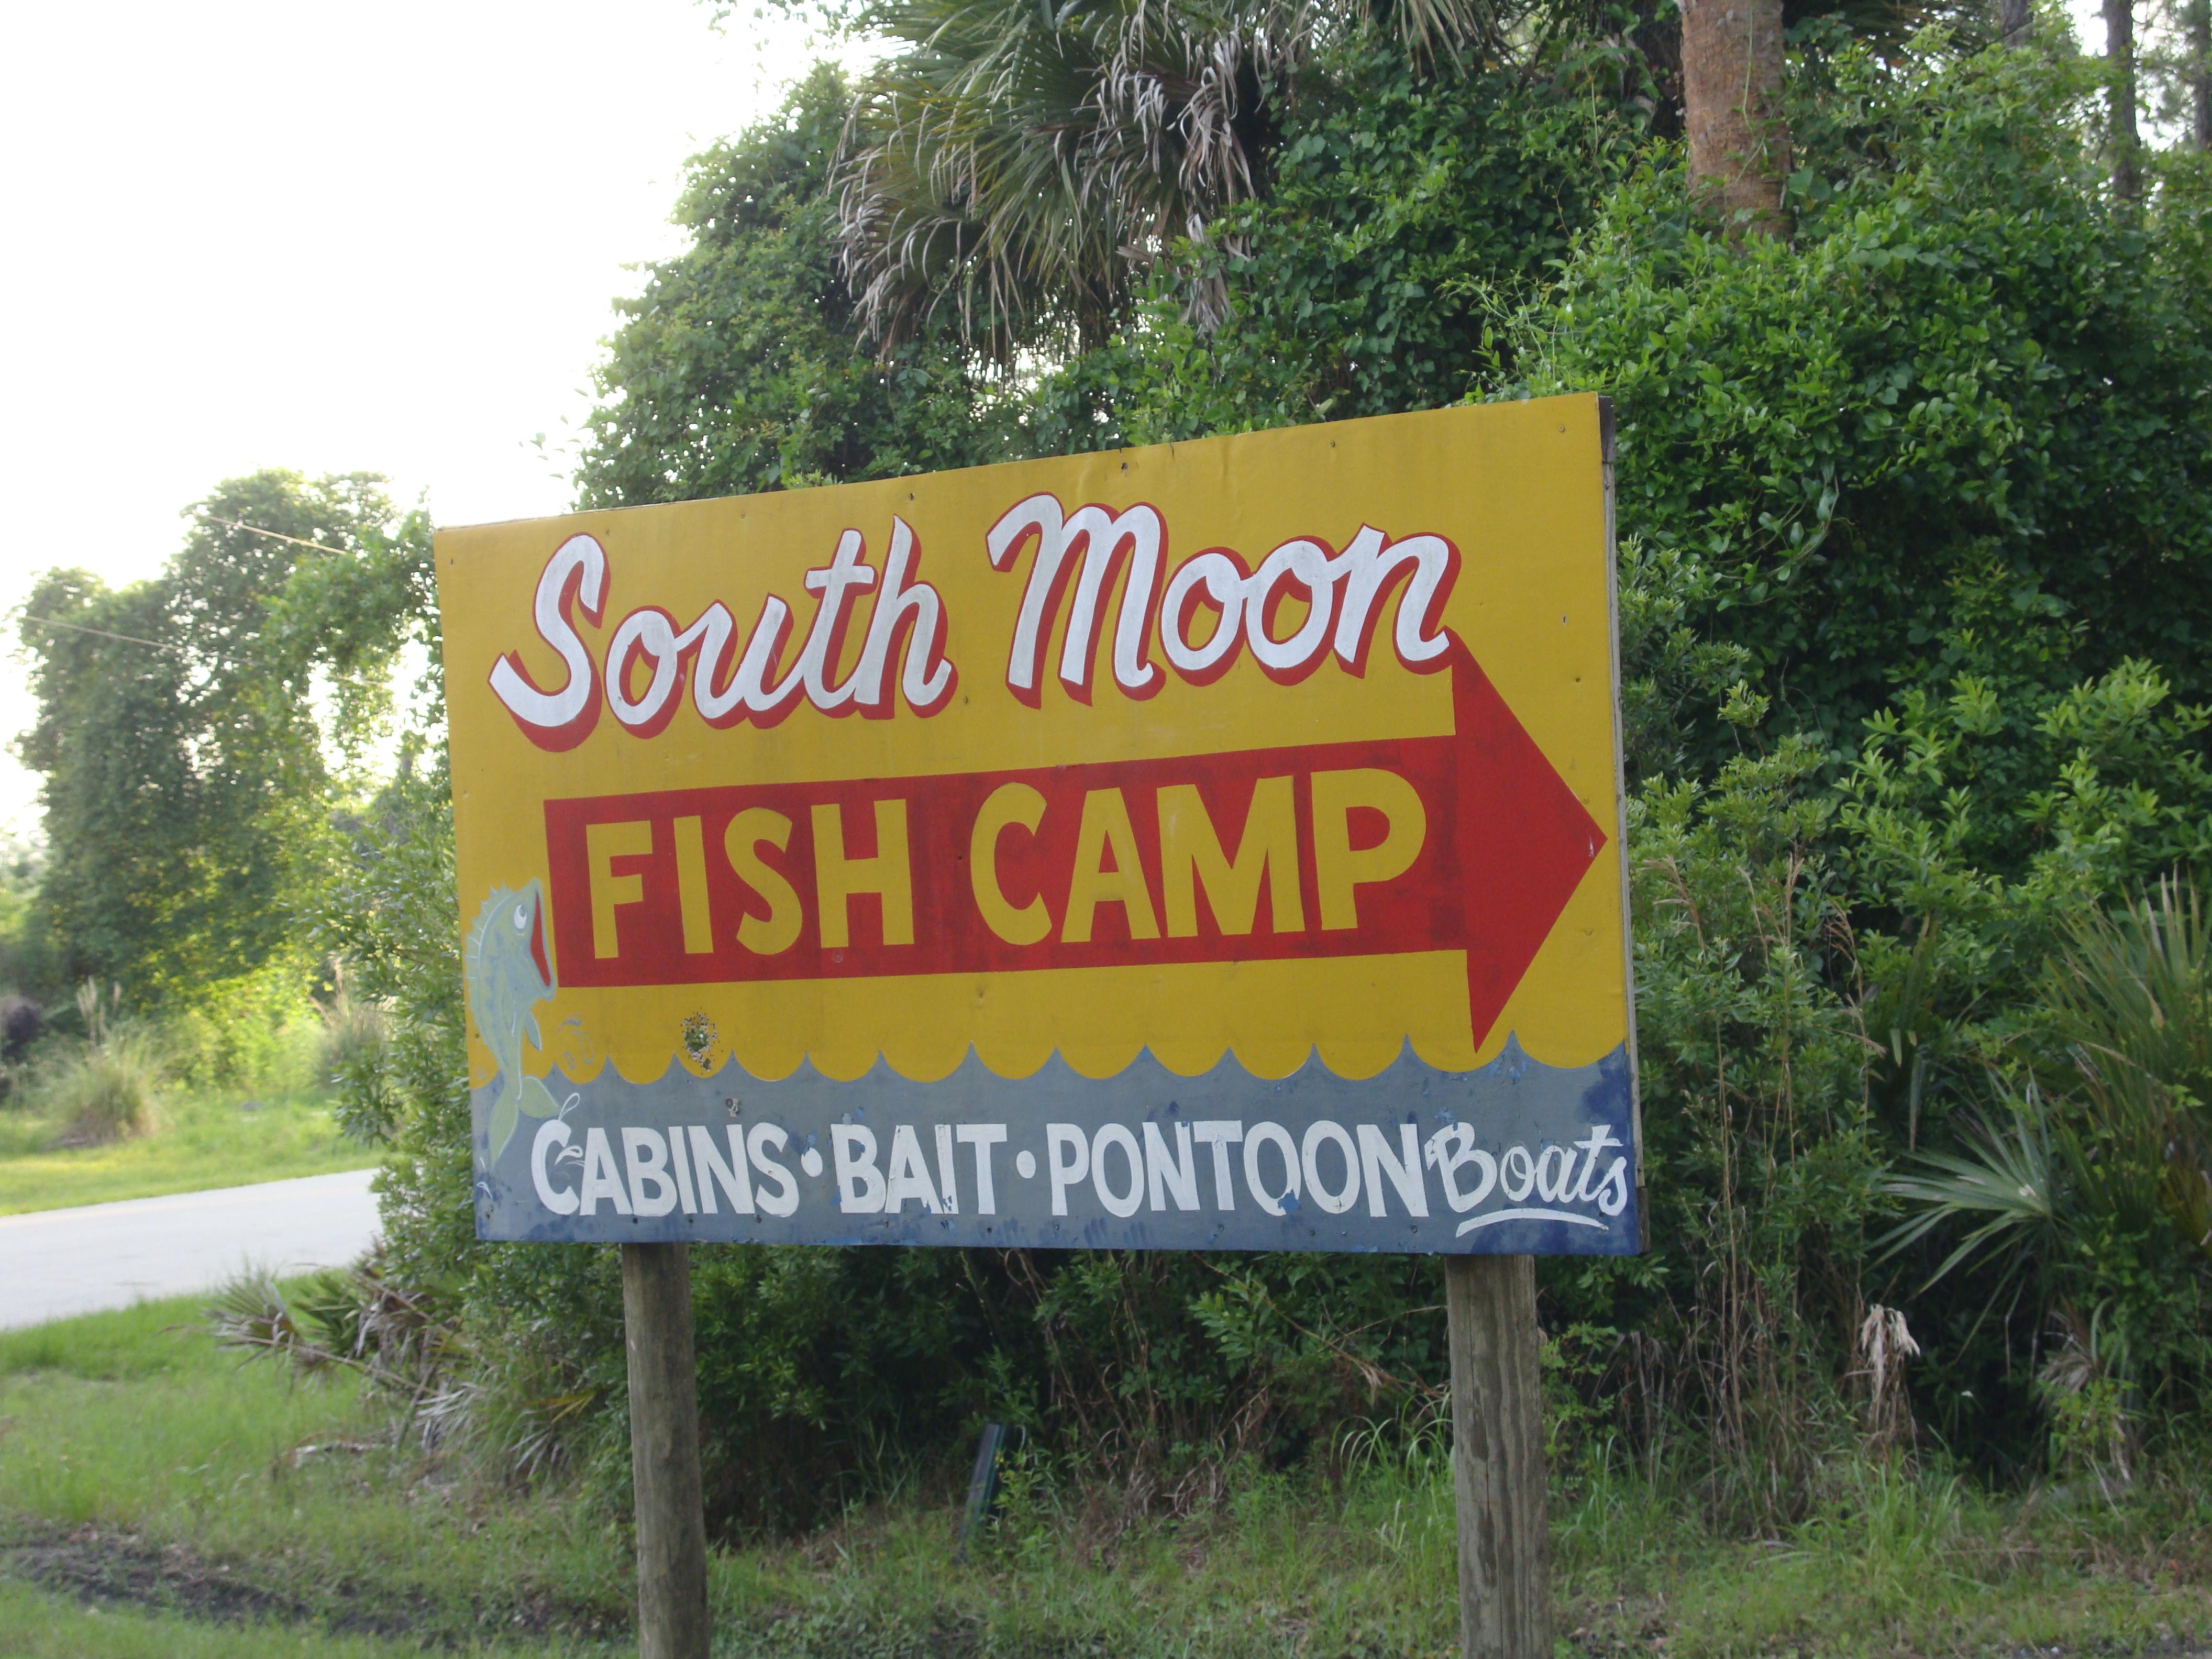 South moon fish camp astor florida for Fish camp menu